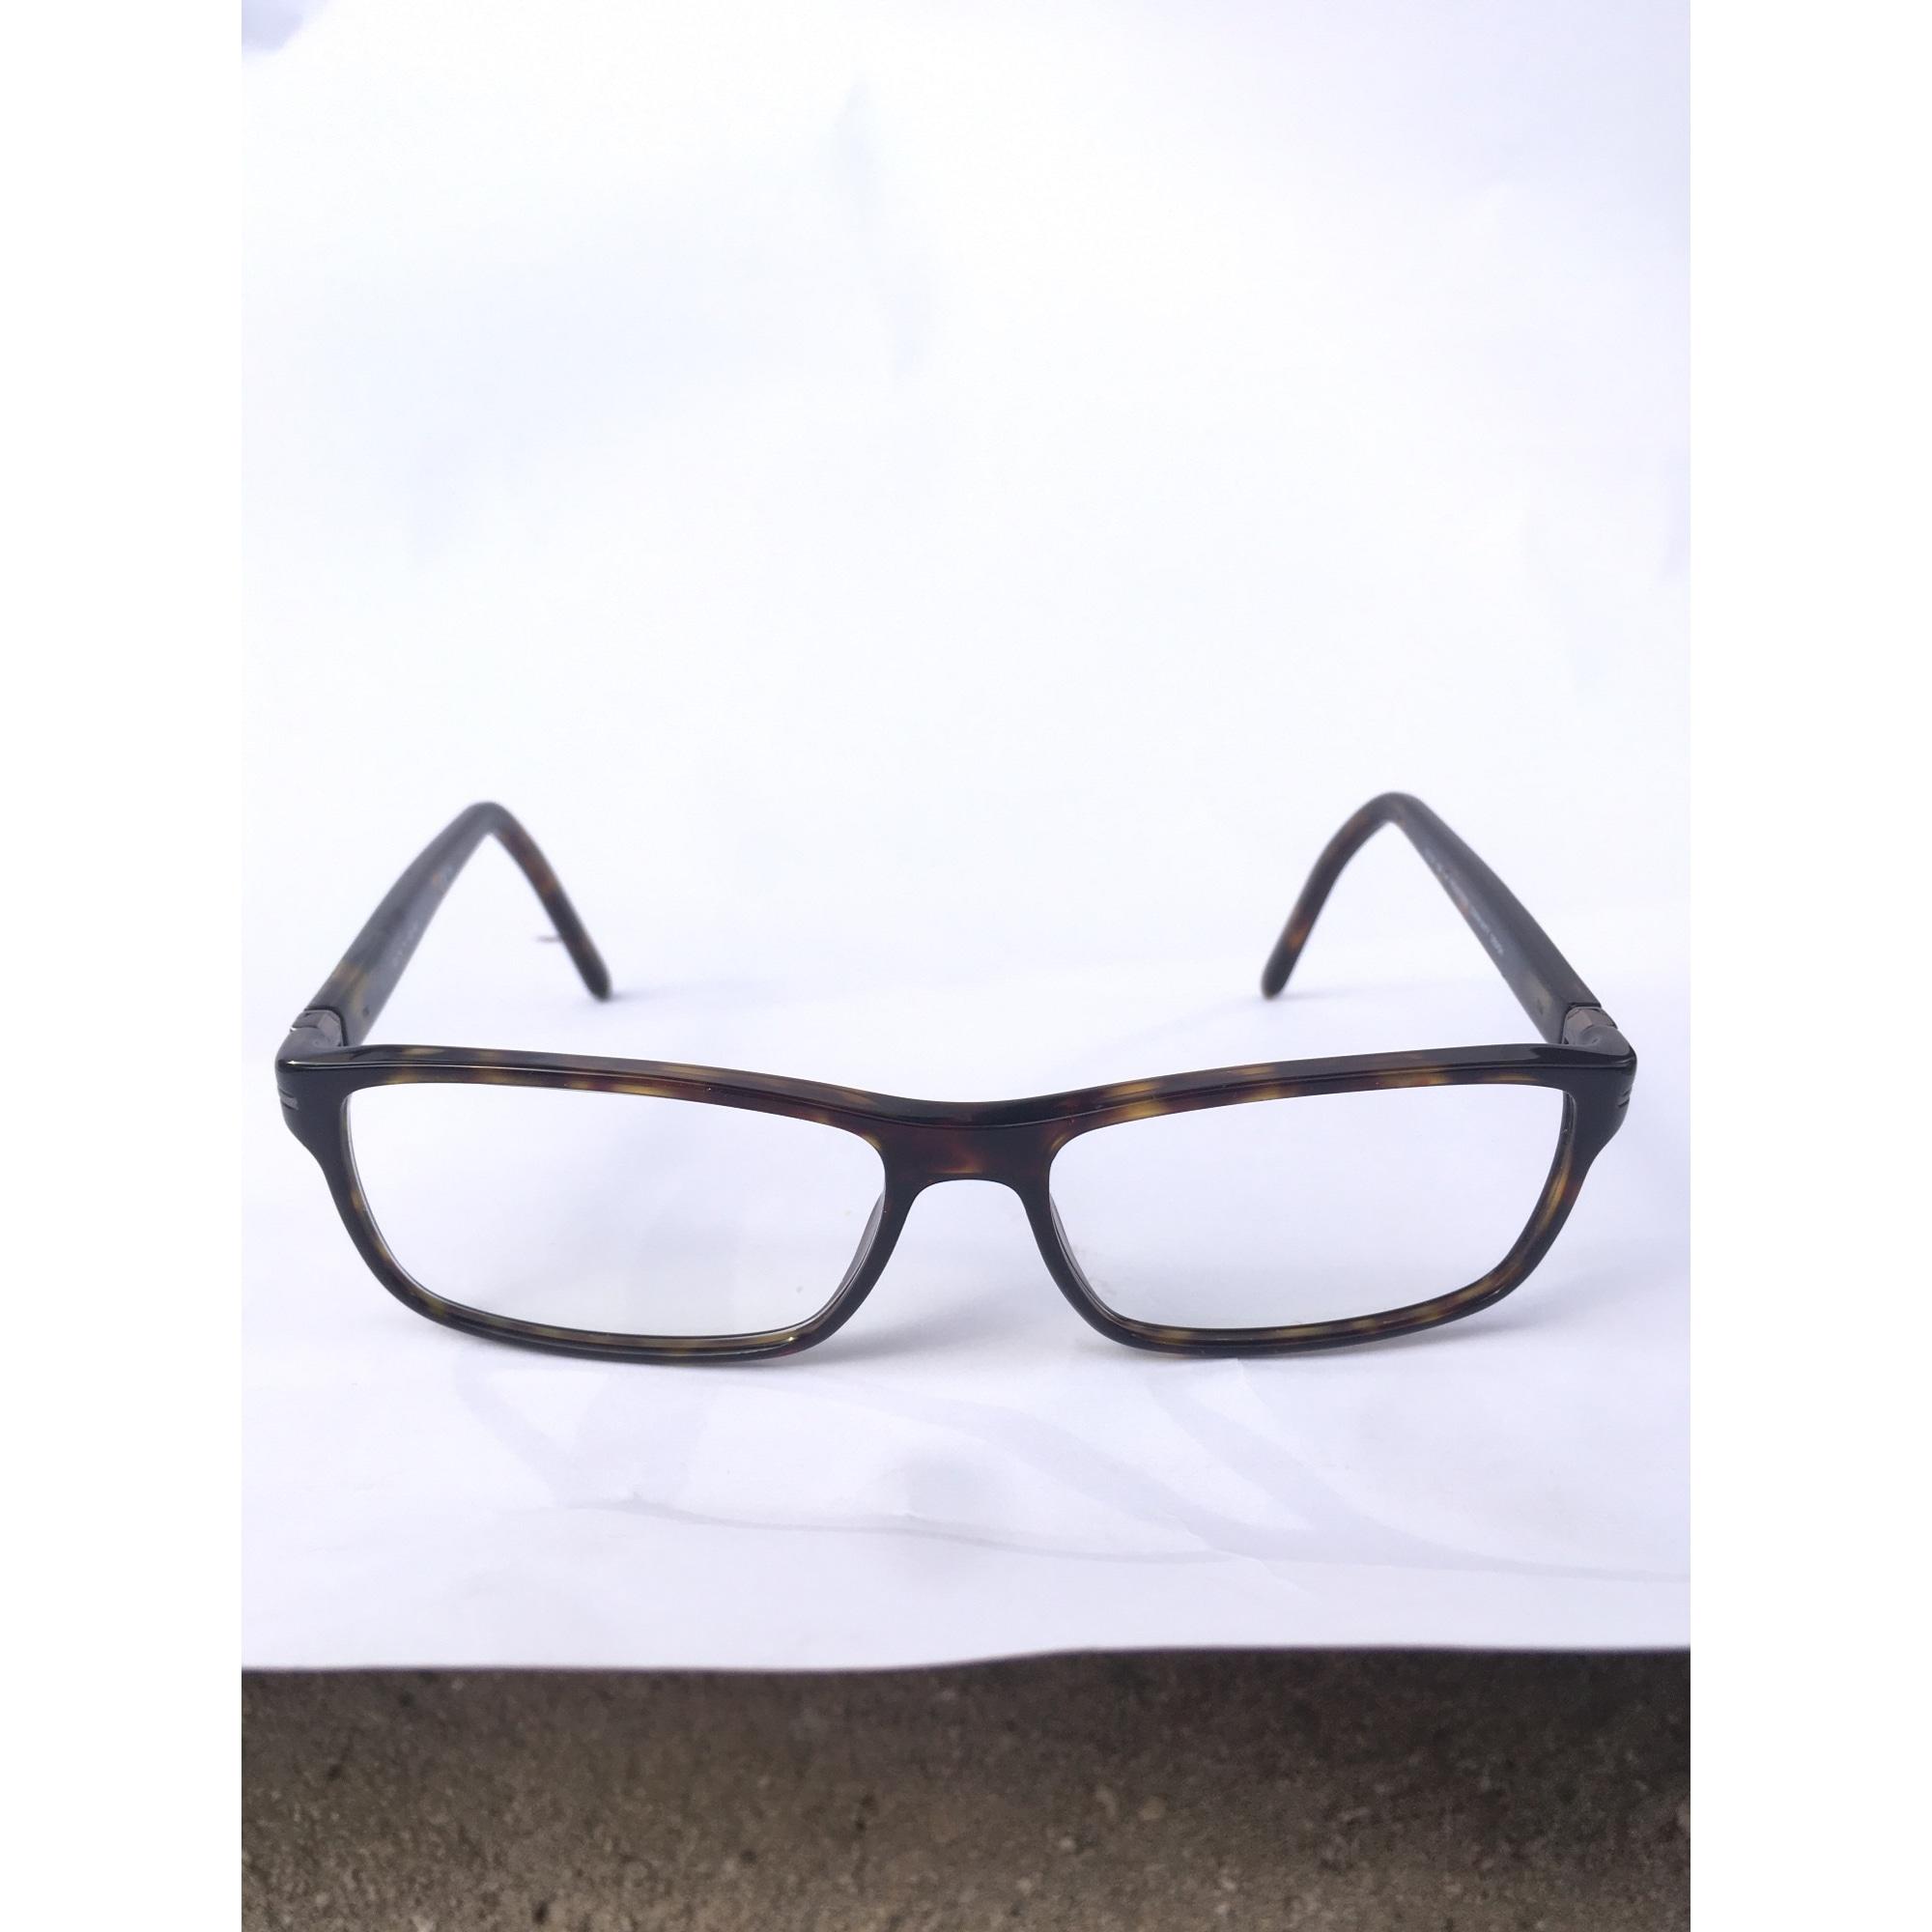 Eyeglass Frames OXYDO Brown